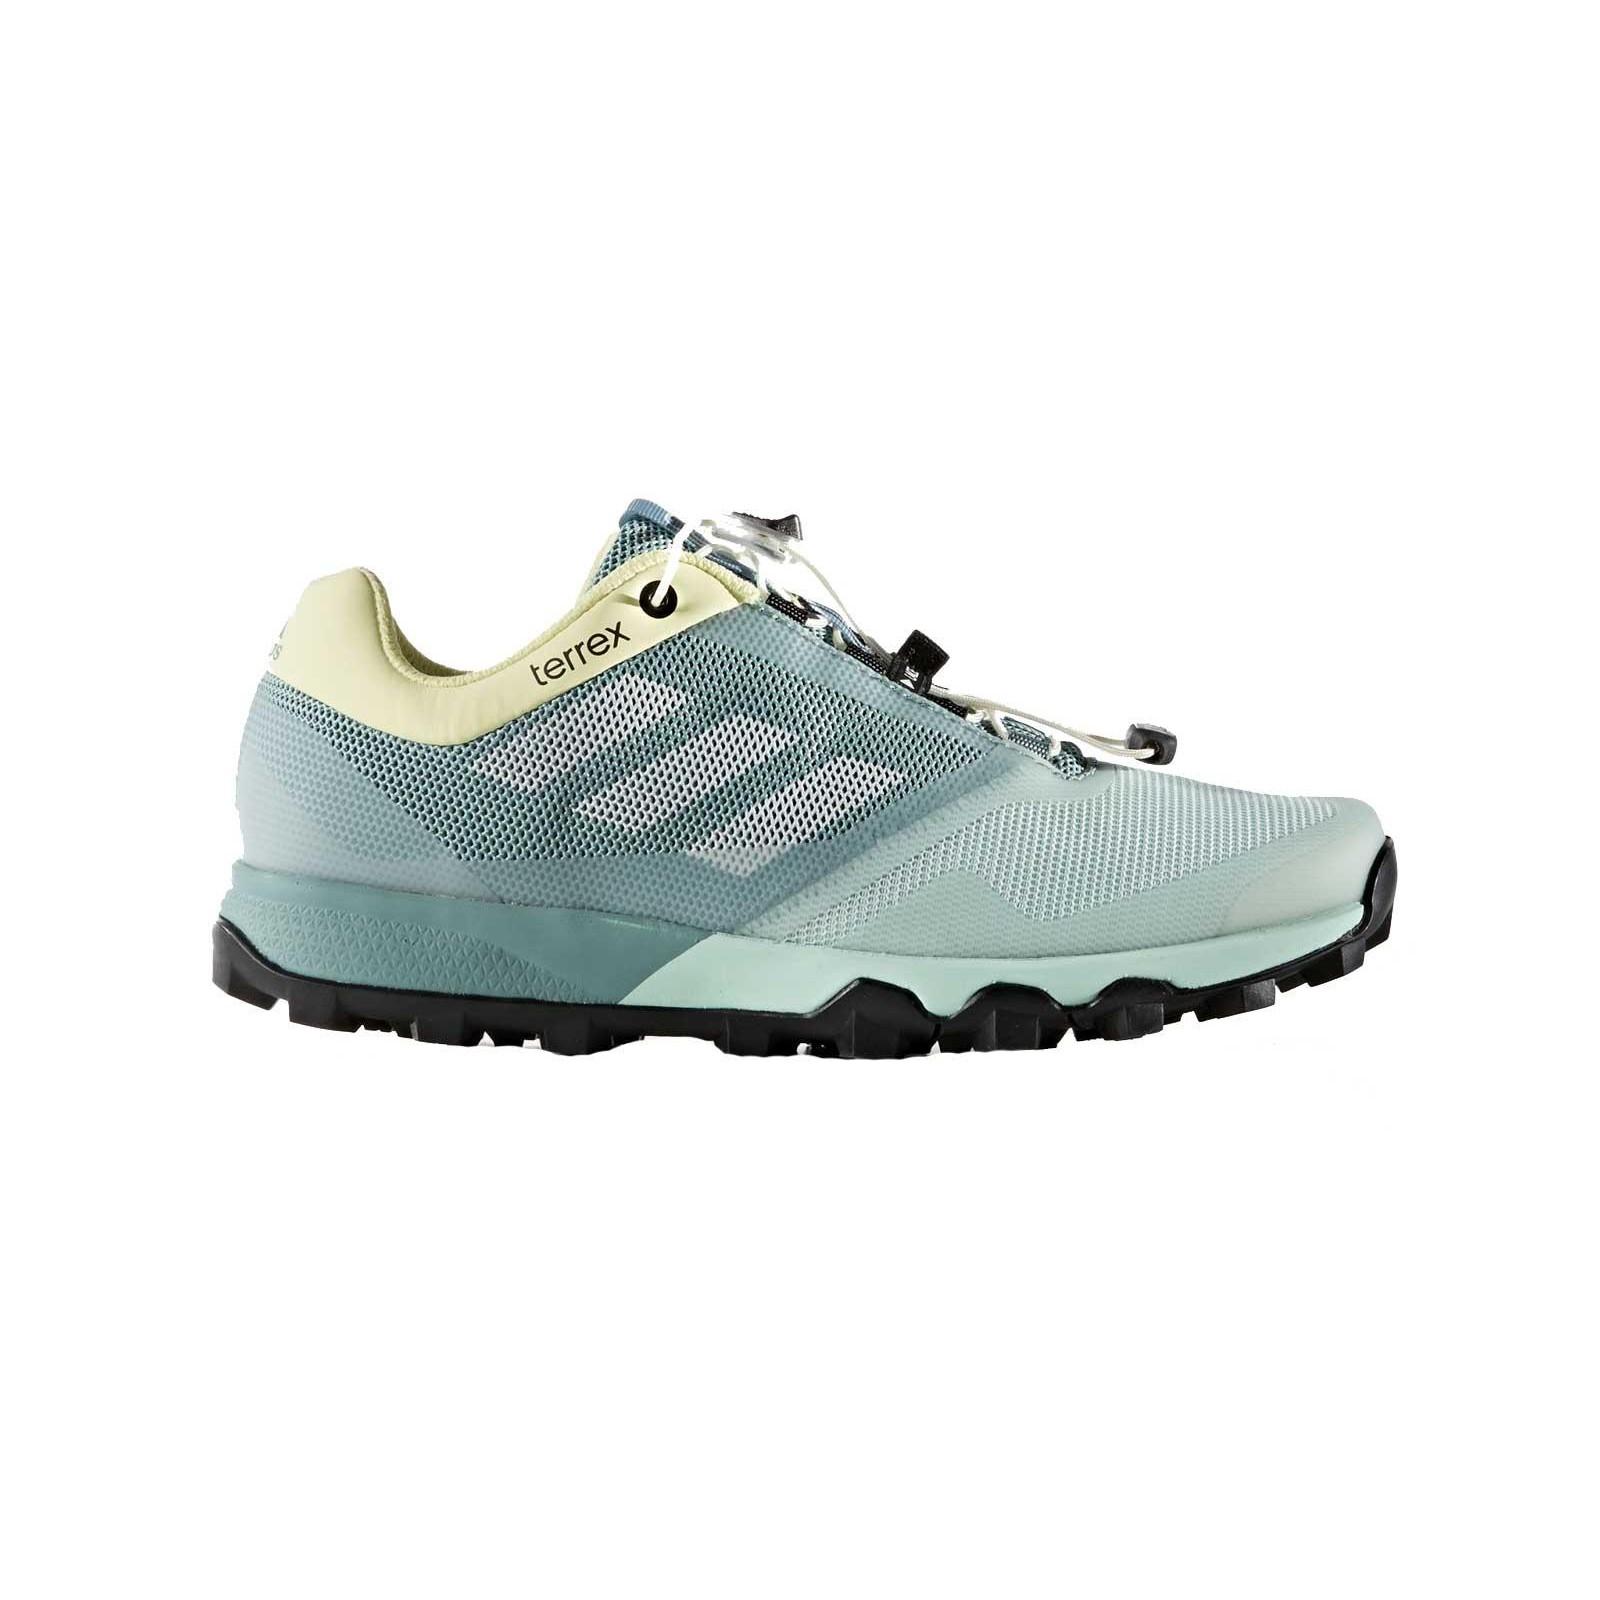 Adidas-TERREX TRAILMAKER W ADIAQ3997